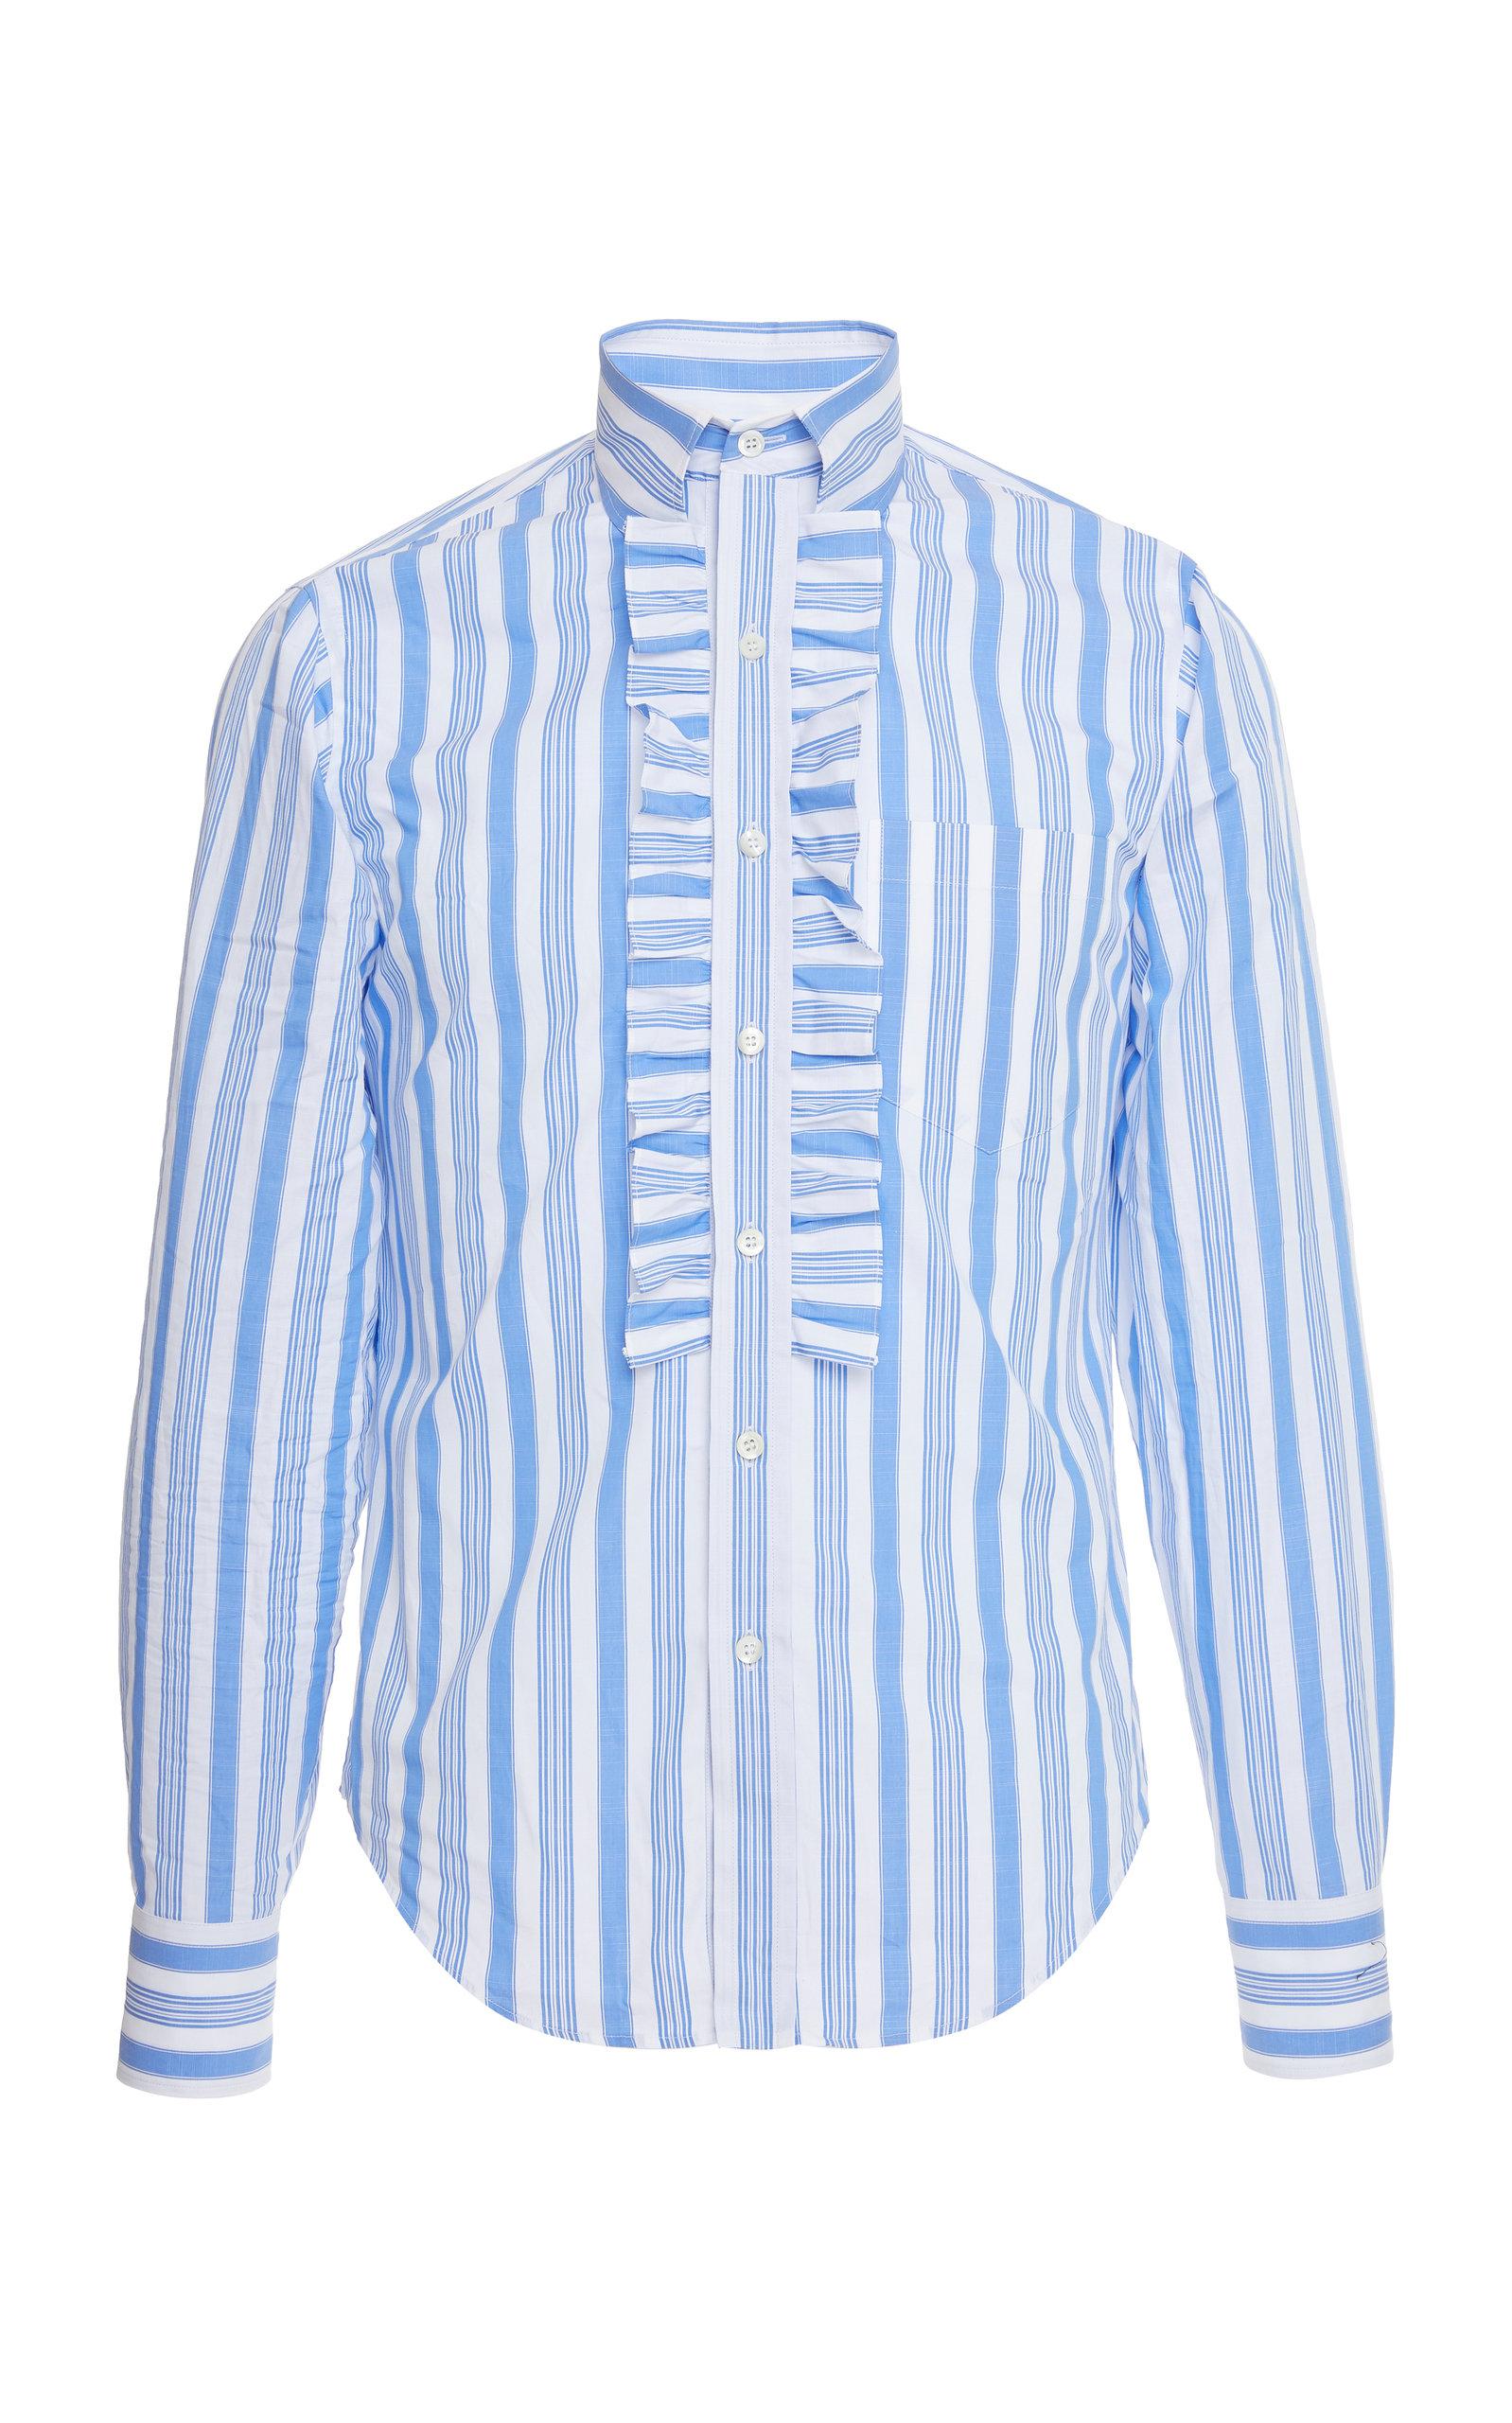 PRADA   Prada Righe Baiadera Ruffle Cotton-Poplin Dress Shirt   Goxip